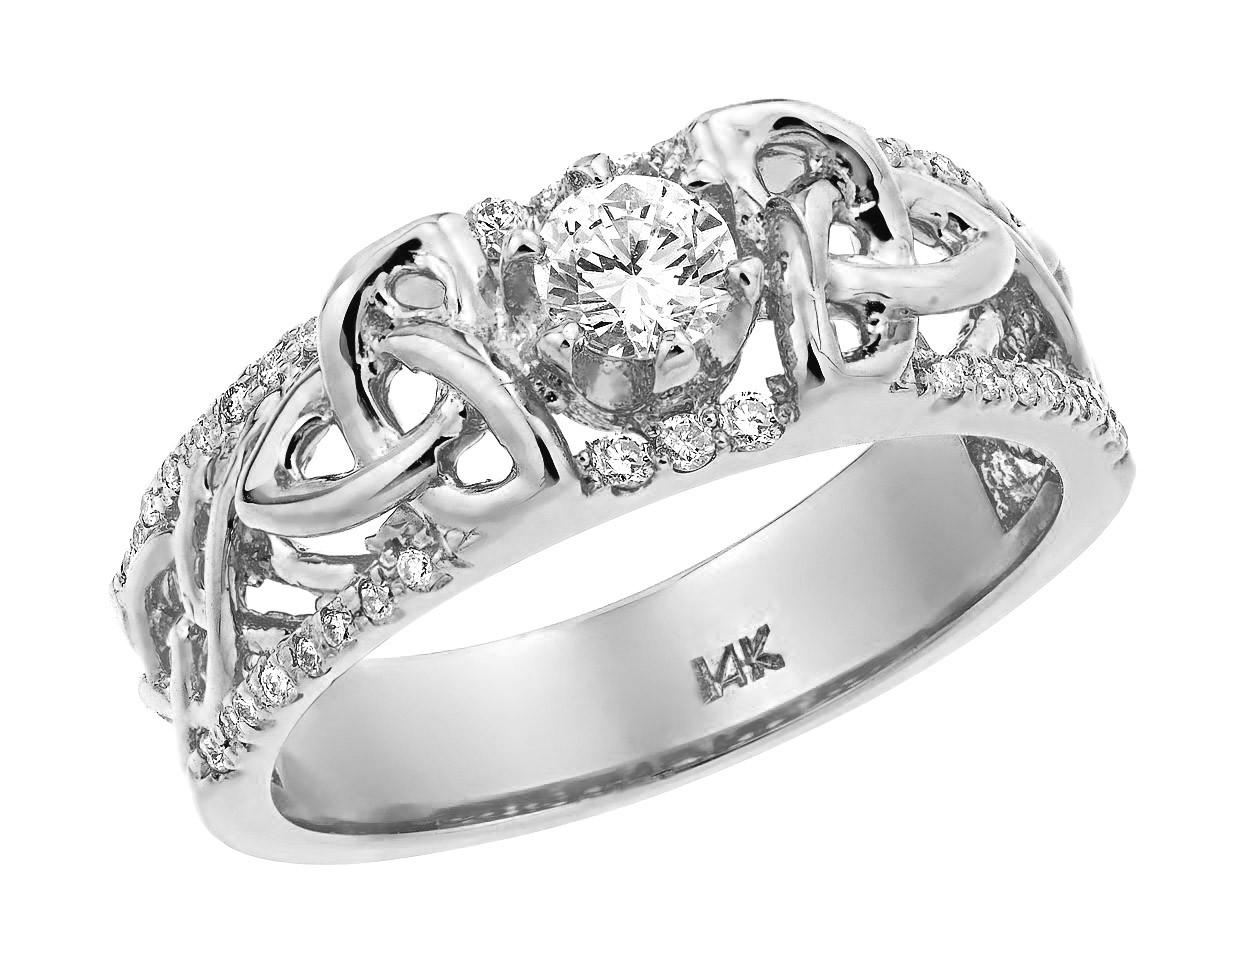 White Gold Celtic Trinity Elegance Diamond Wedding Ring